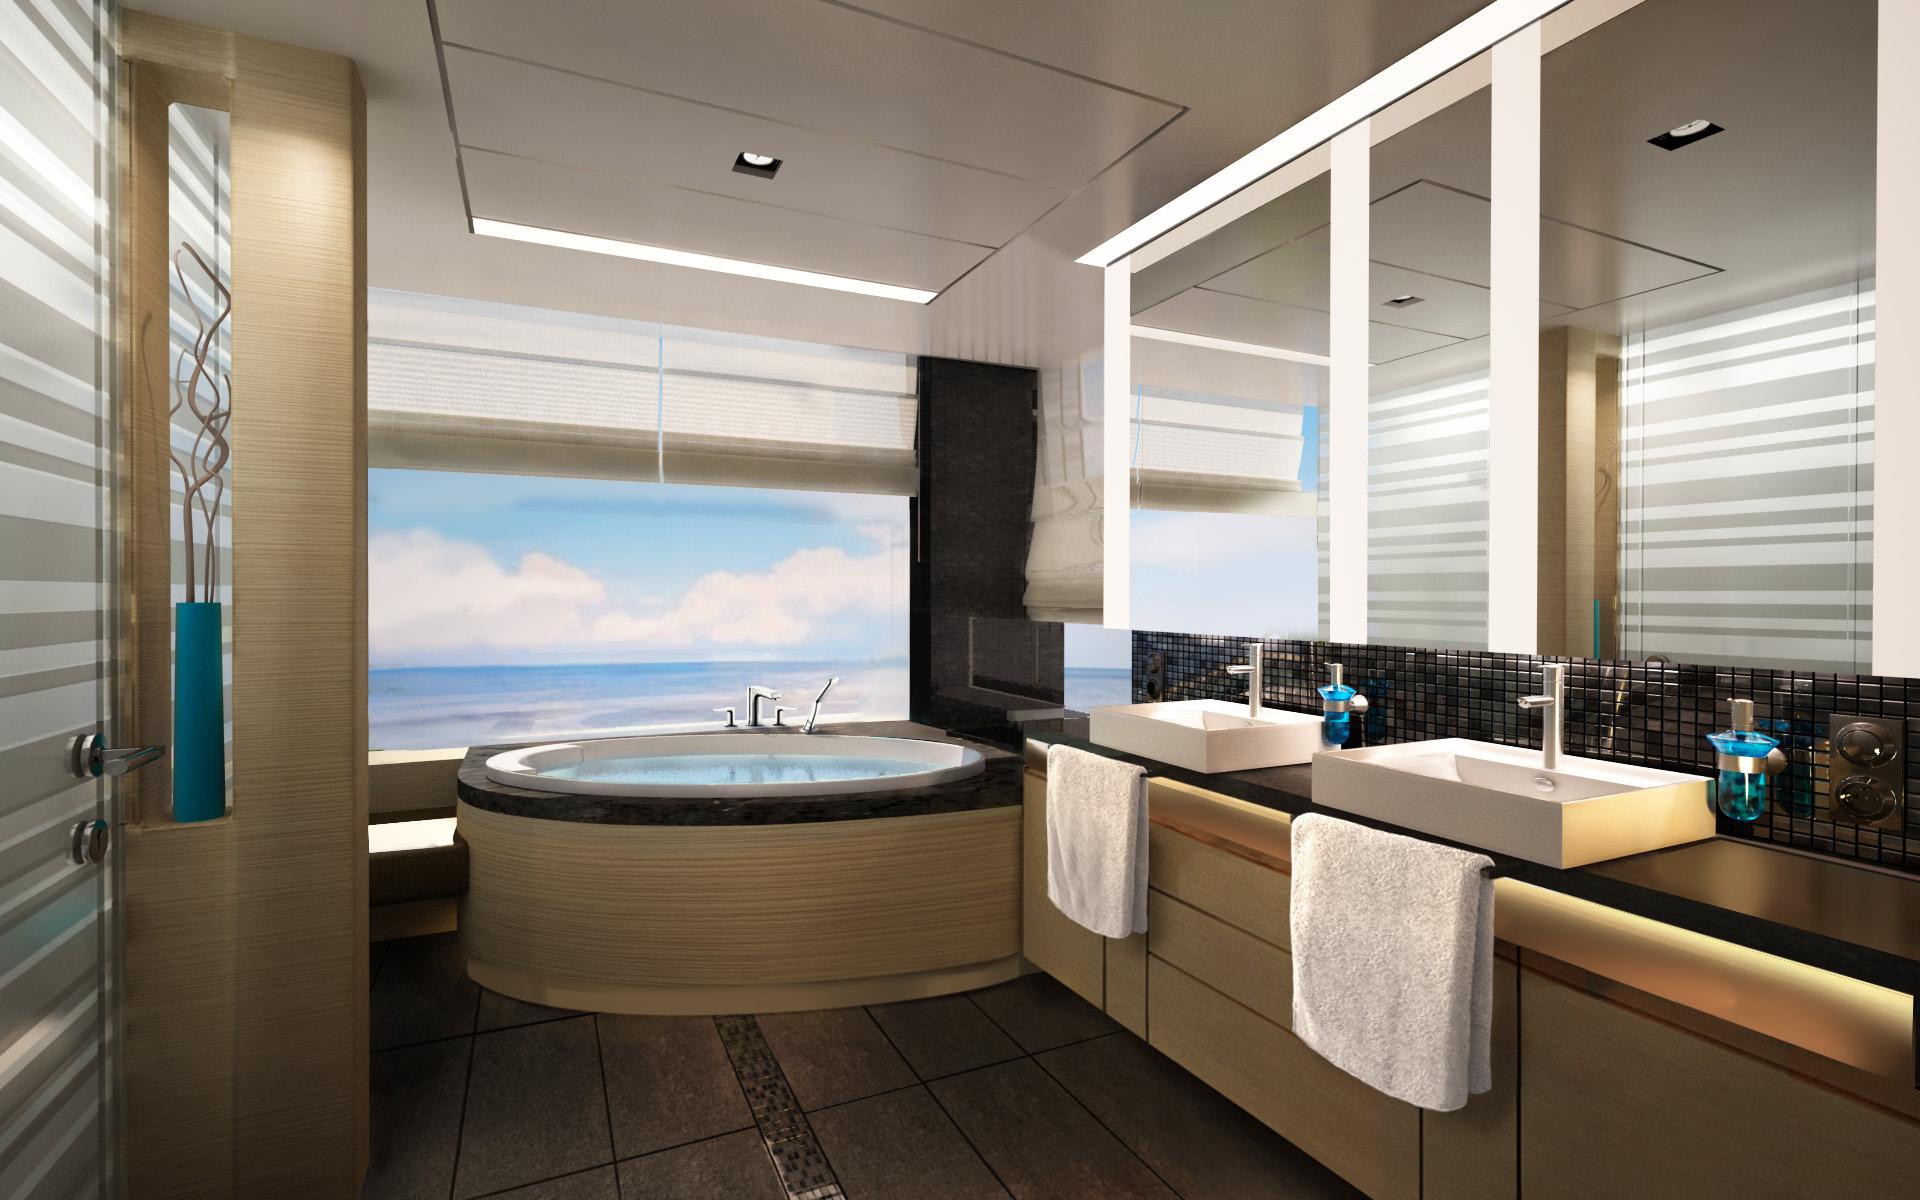 The One Where Norwegian S Project Breakaway Suites Were